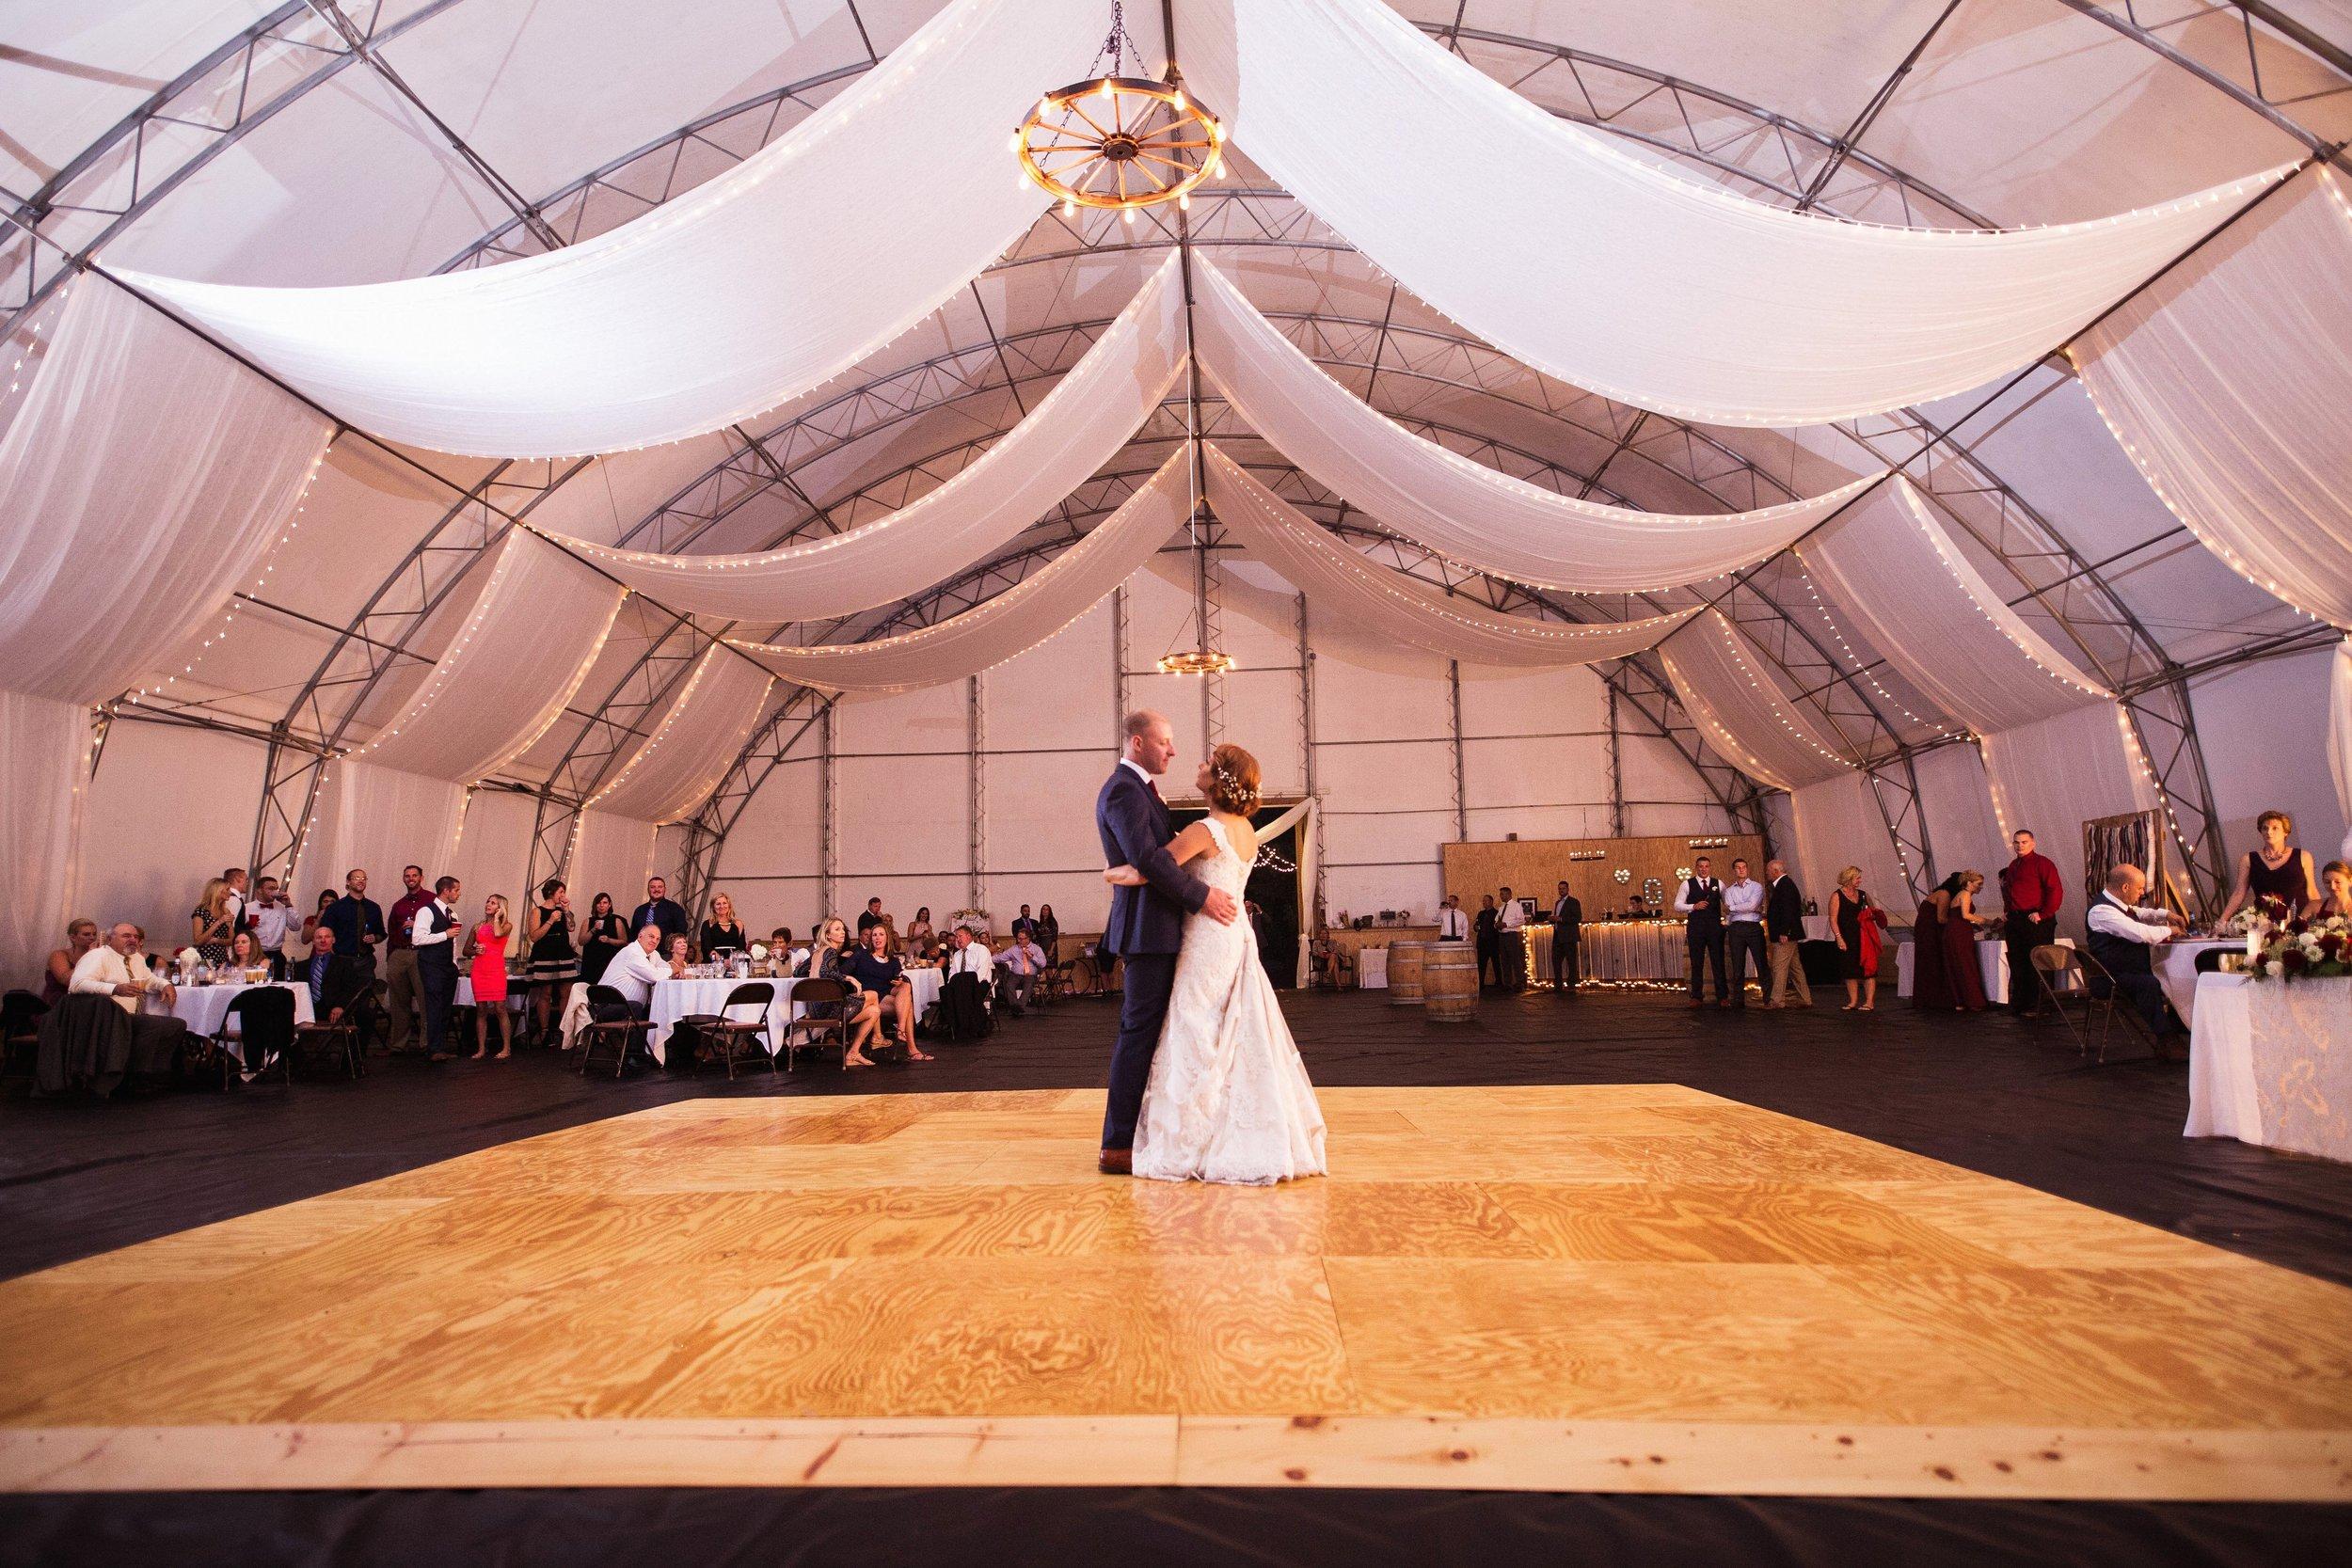 Blog-Lisa-James-Wedding-at Rosebud Estate Weddings in Arcade NY by Stefan-Ludwig-Photography-Buffalo-NY-72-x.jpg